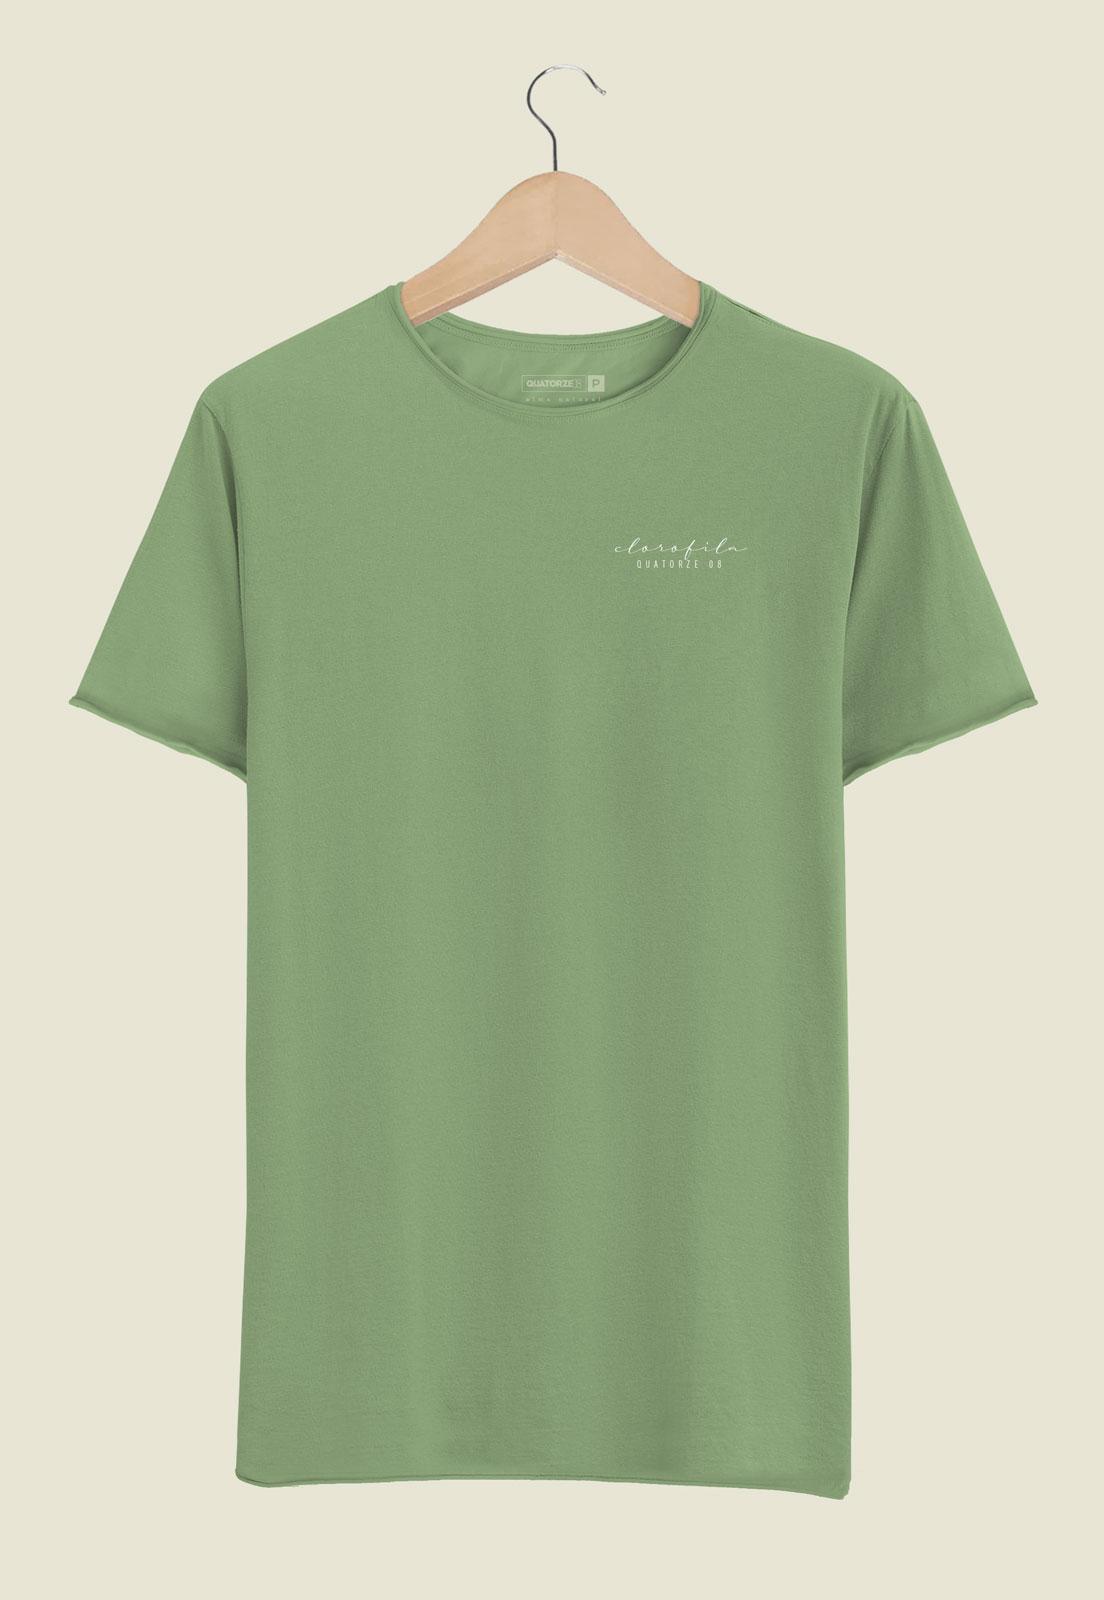 Camiseta Clorofila Tingimento Natural